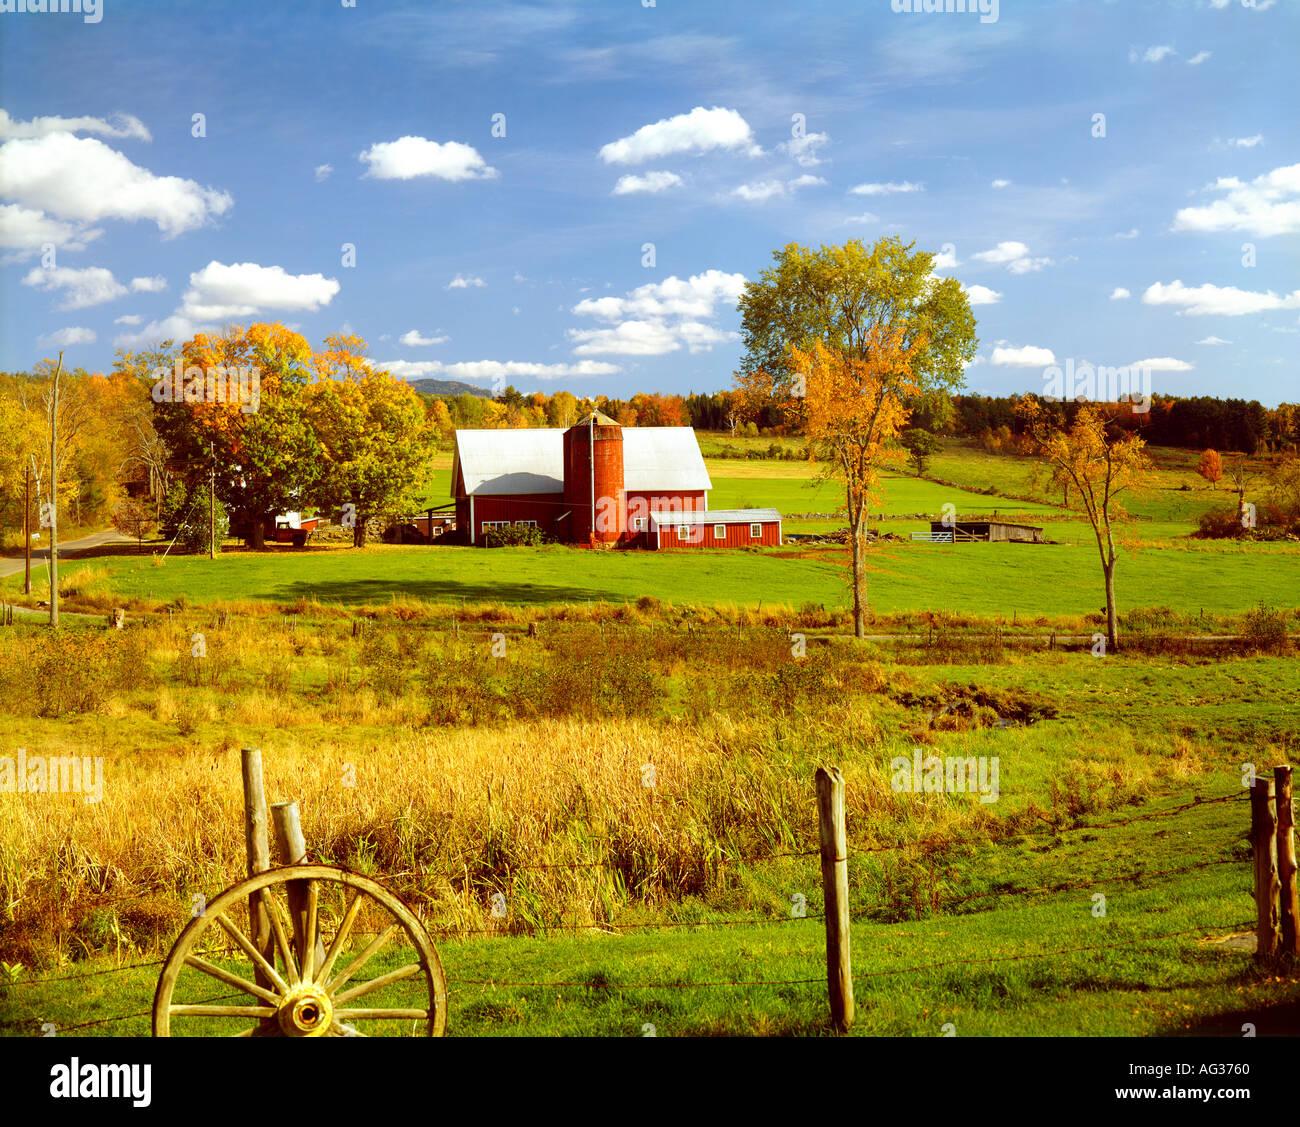 farmland and barn near Barnard Vermont USA - Stock Image